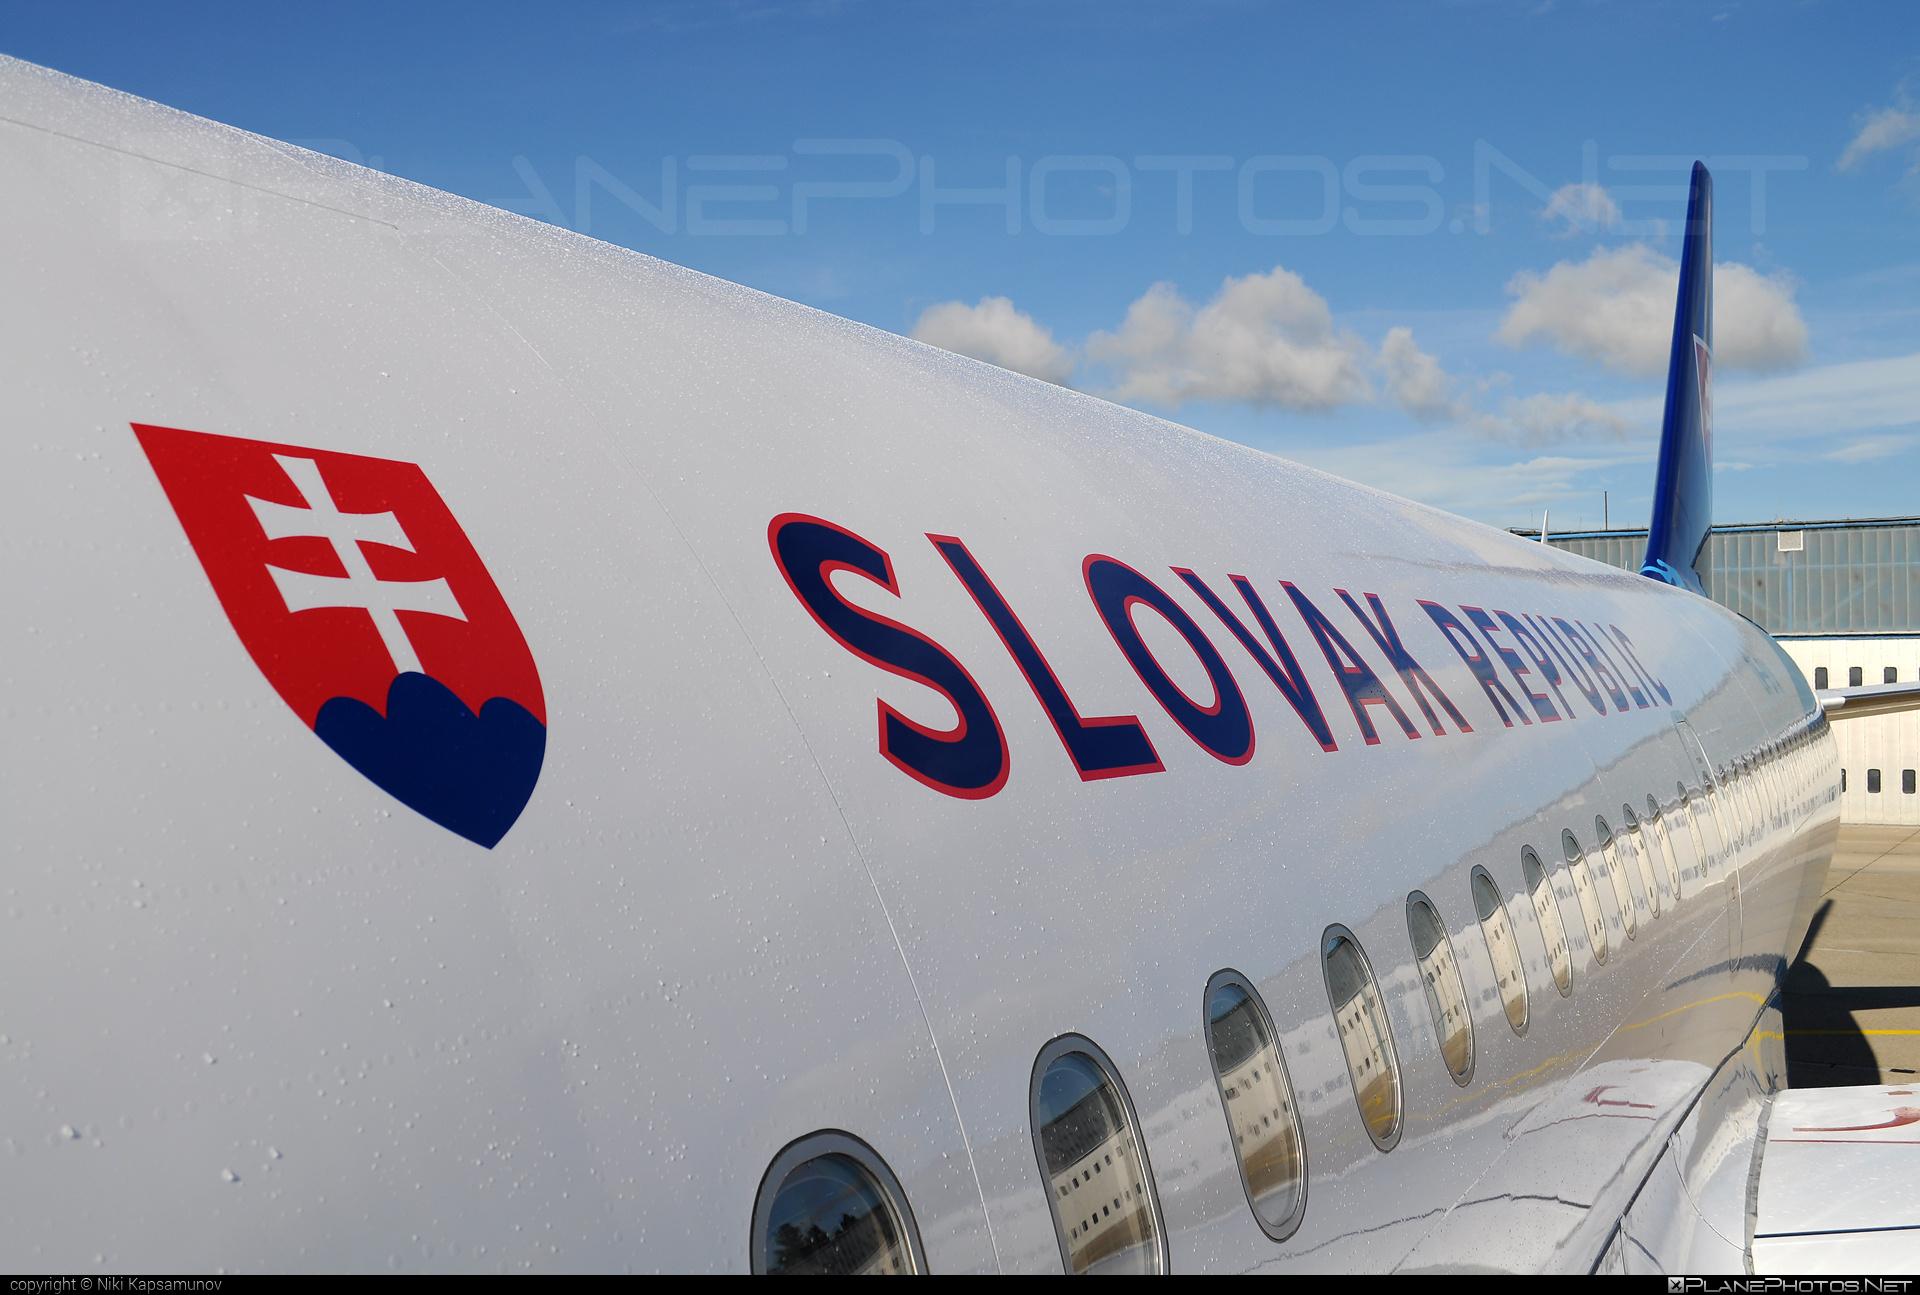 Letecký útvar MV SR (Slovak Government Flying Service) Airbus ACJ319-115 - OM-BYA